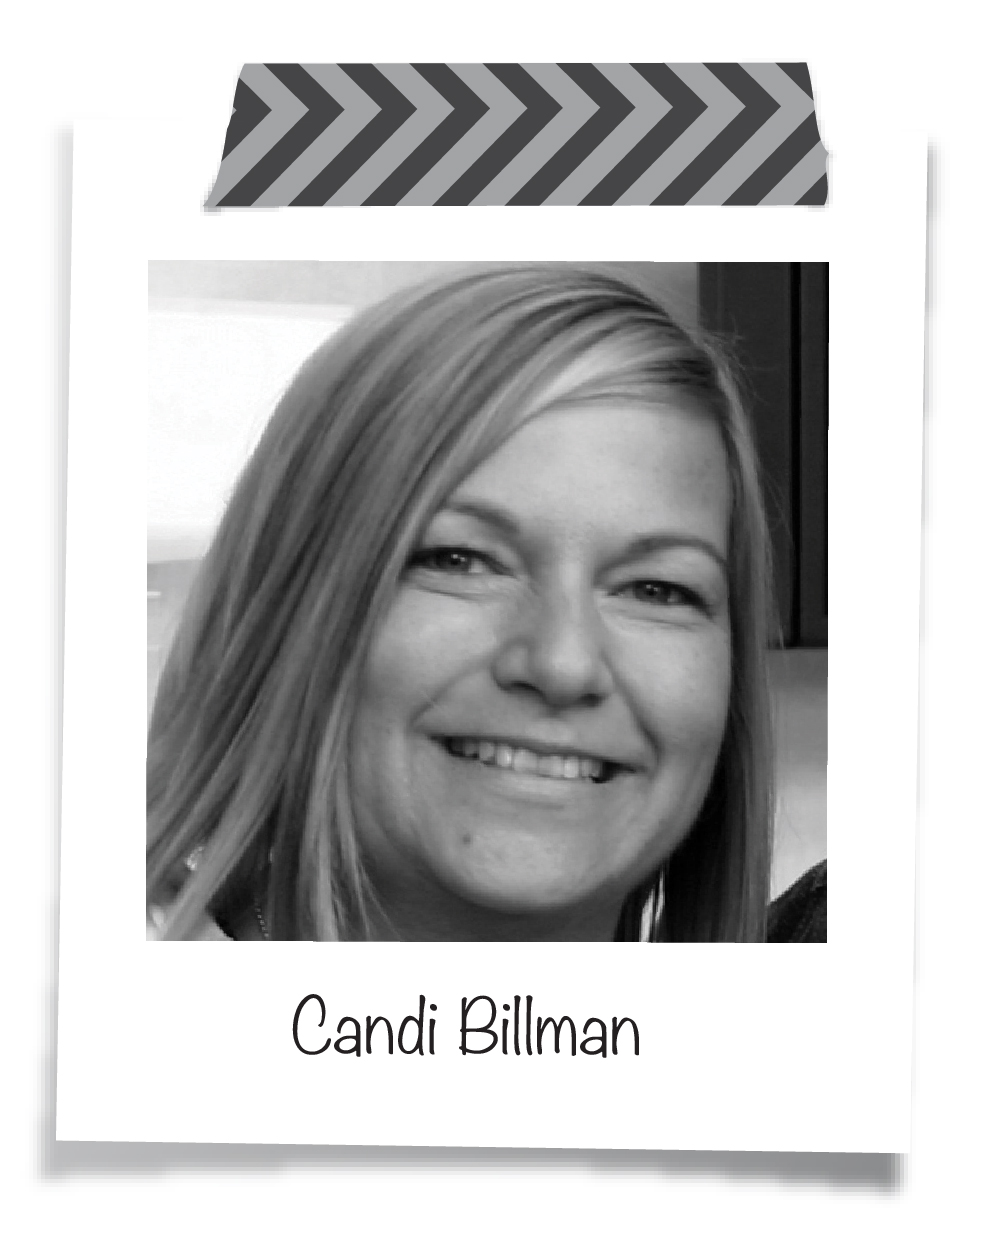 mambi Design Team member Candi Billman